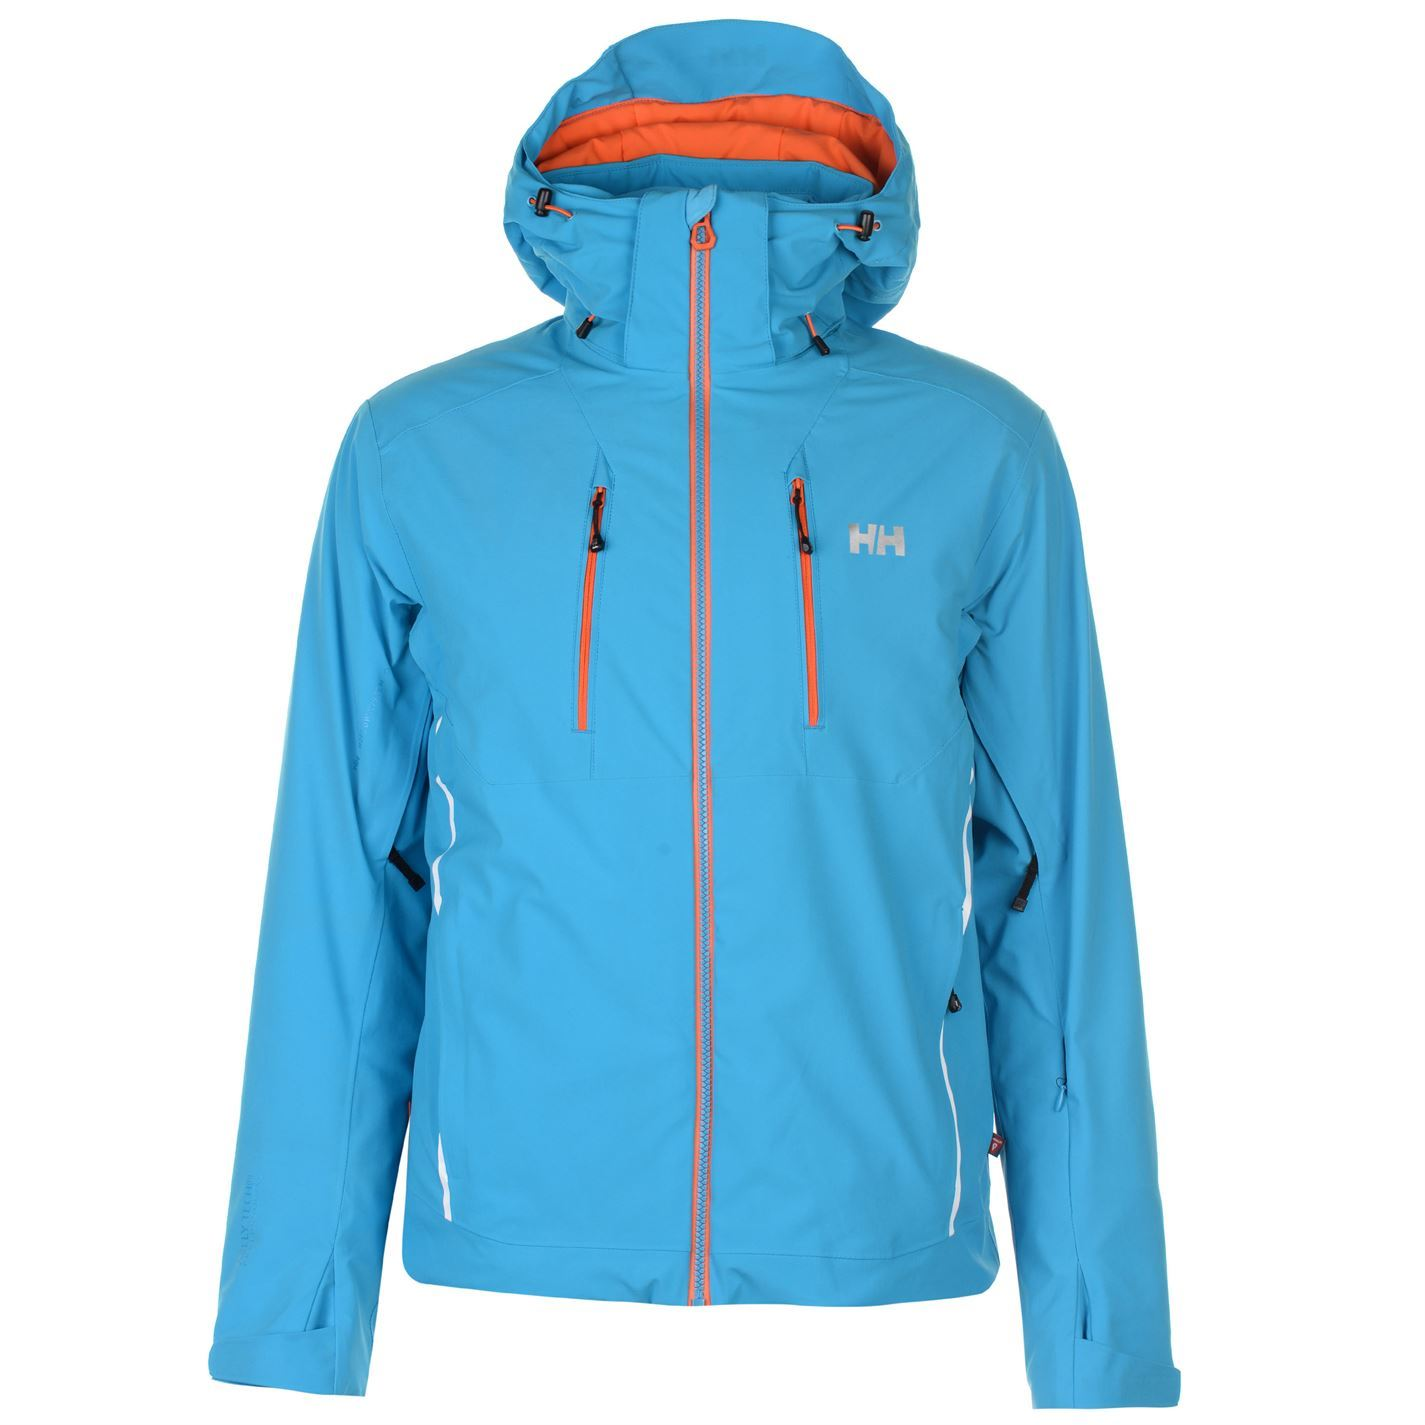 Details about Helly Hansen Mens Alpha 2.0 Ski Jacket Hooded Top Coat  Waterproof Windproof Warm c562e5fa7d495